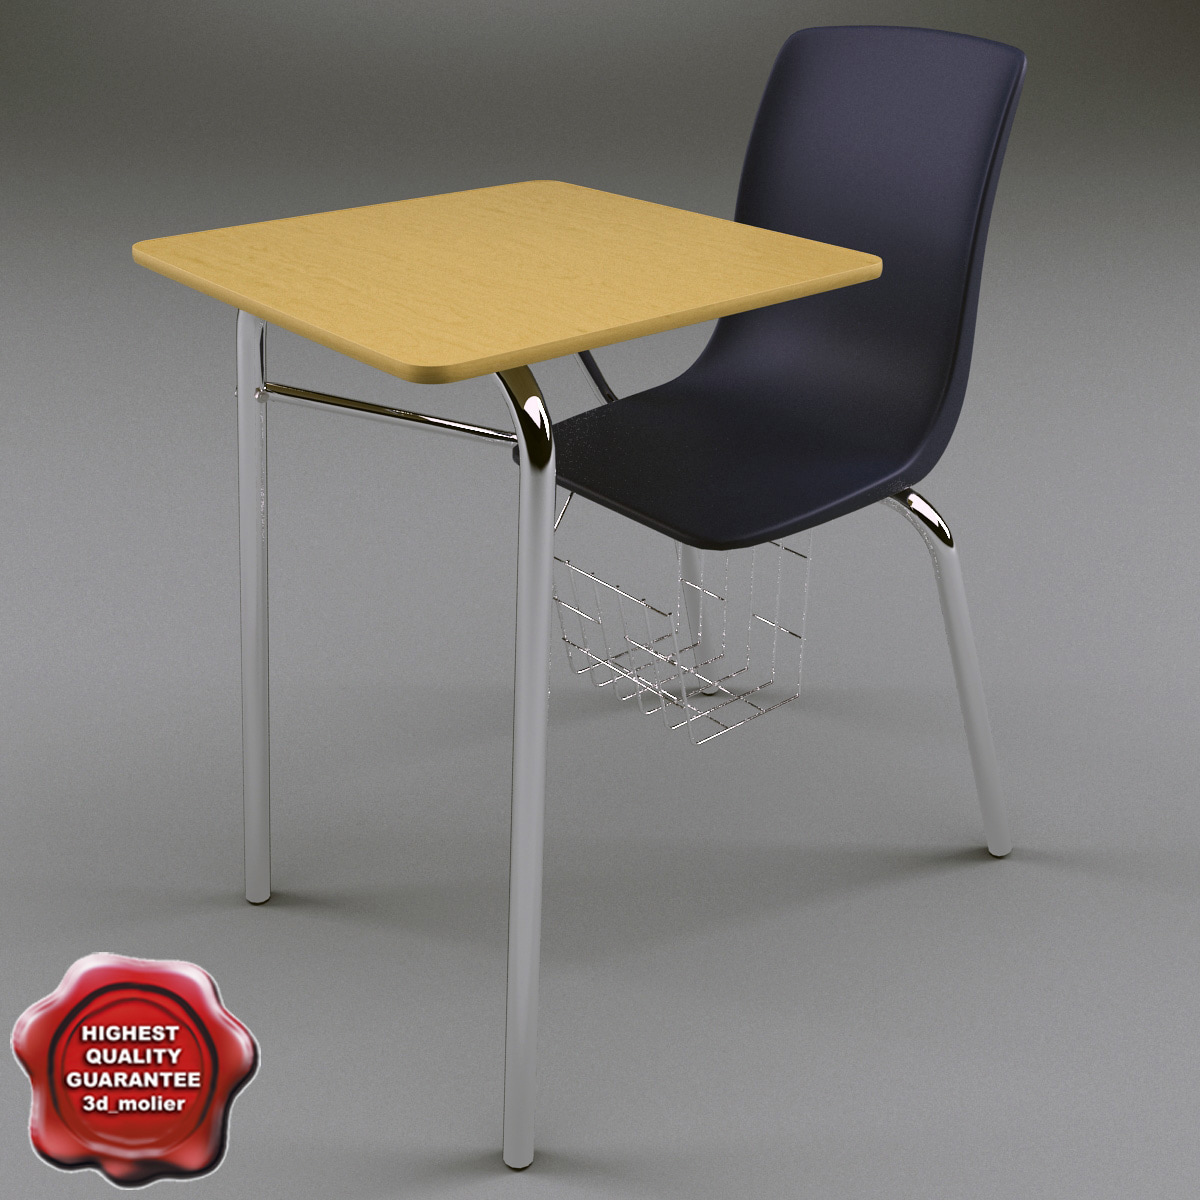 School_desk_0.jpg